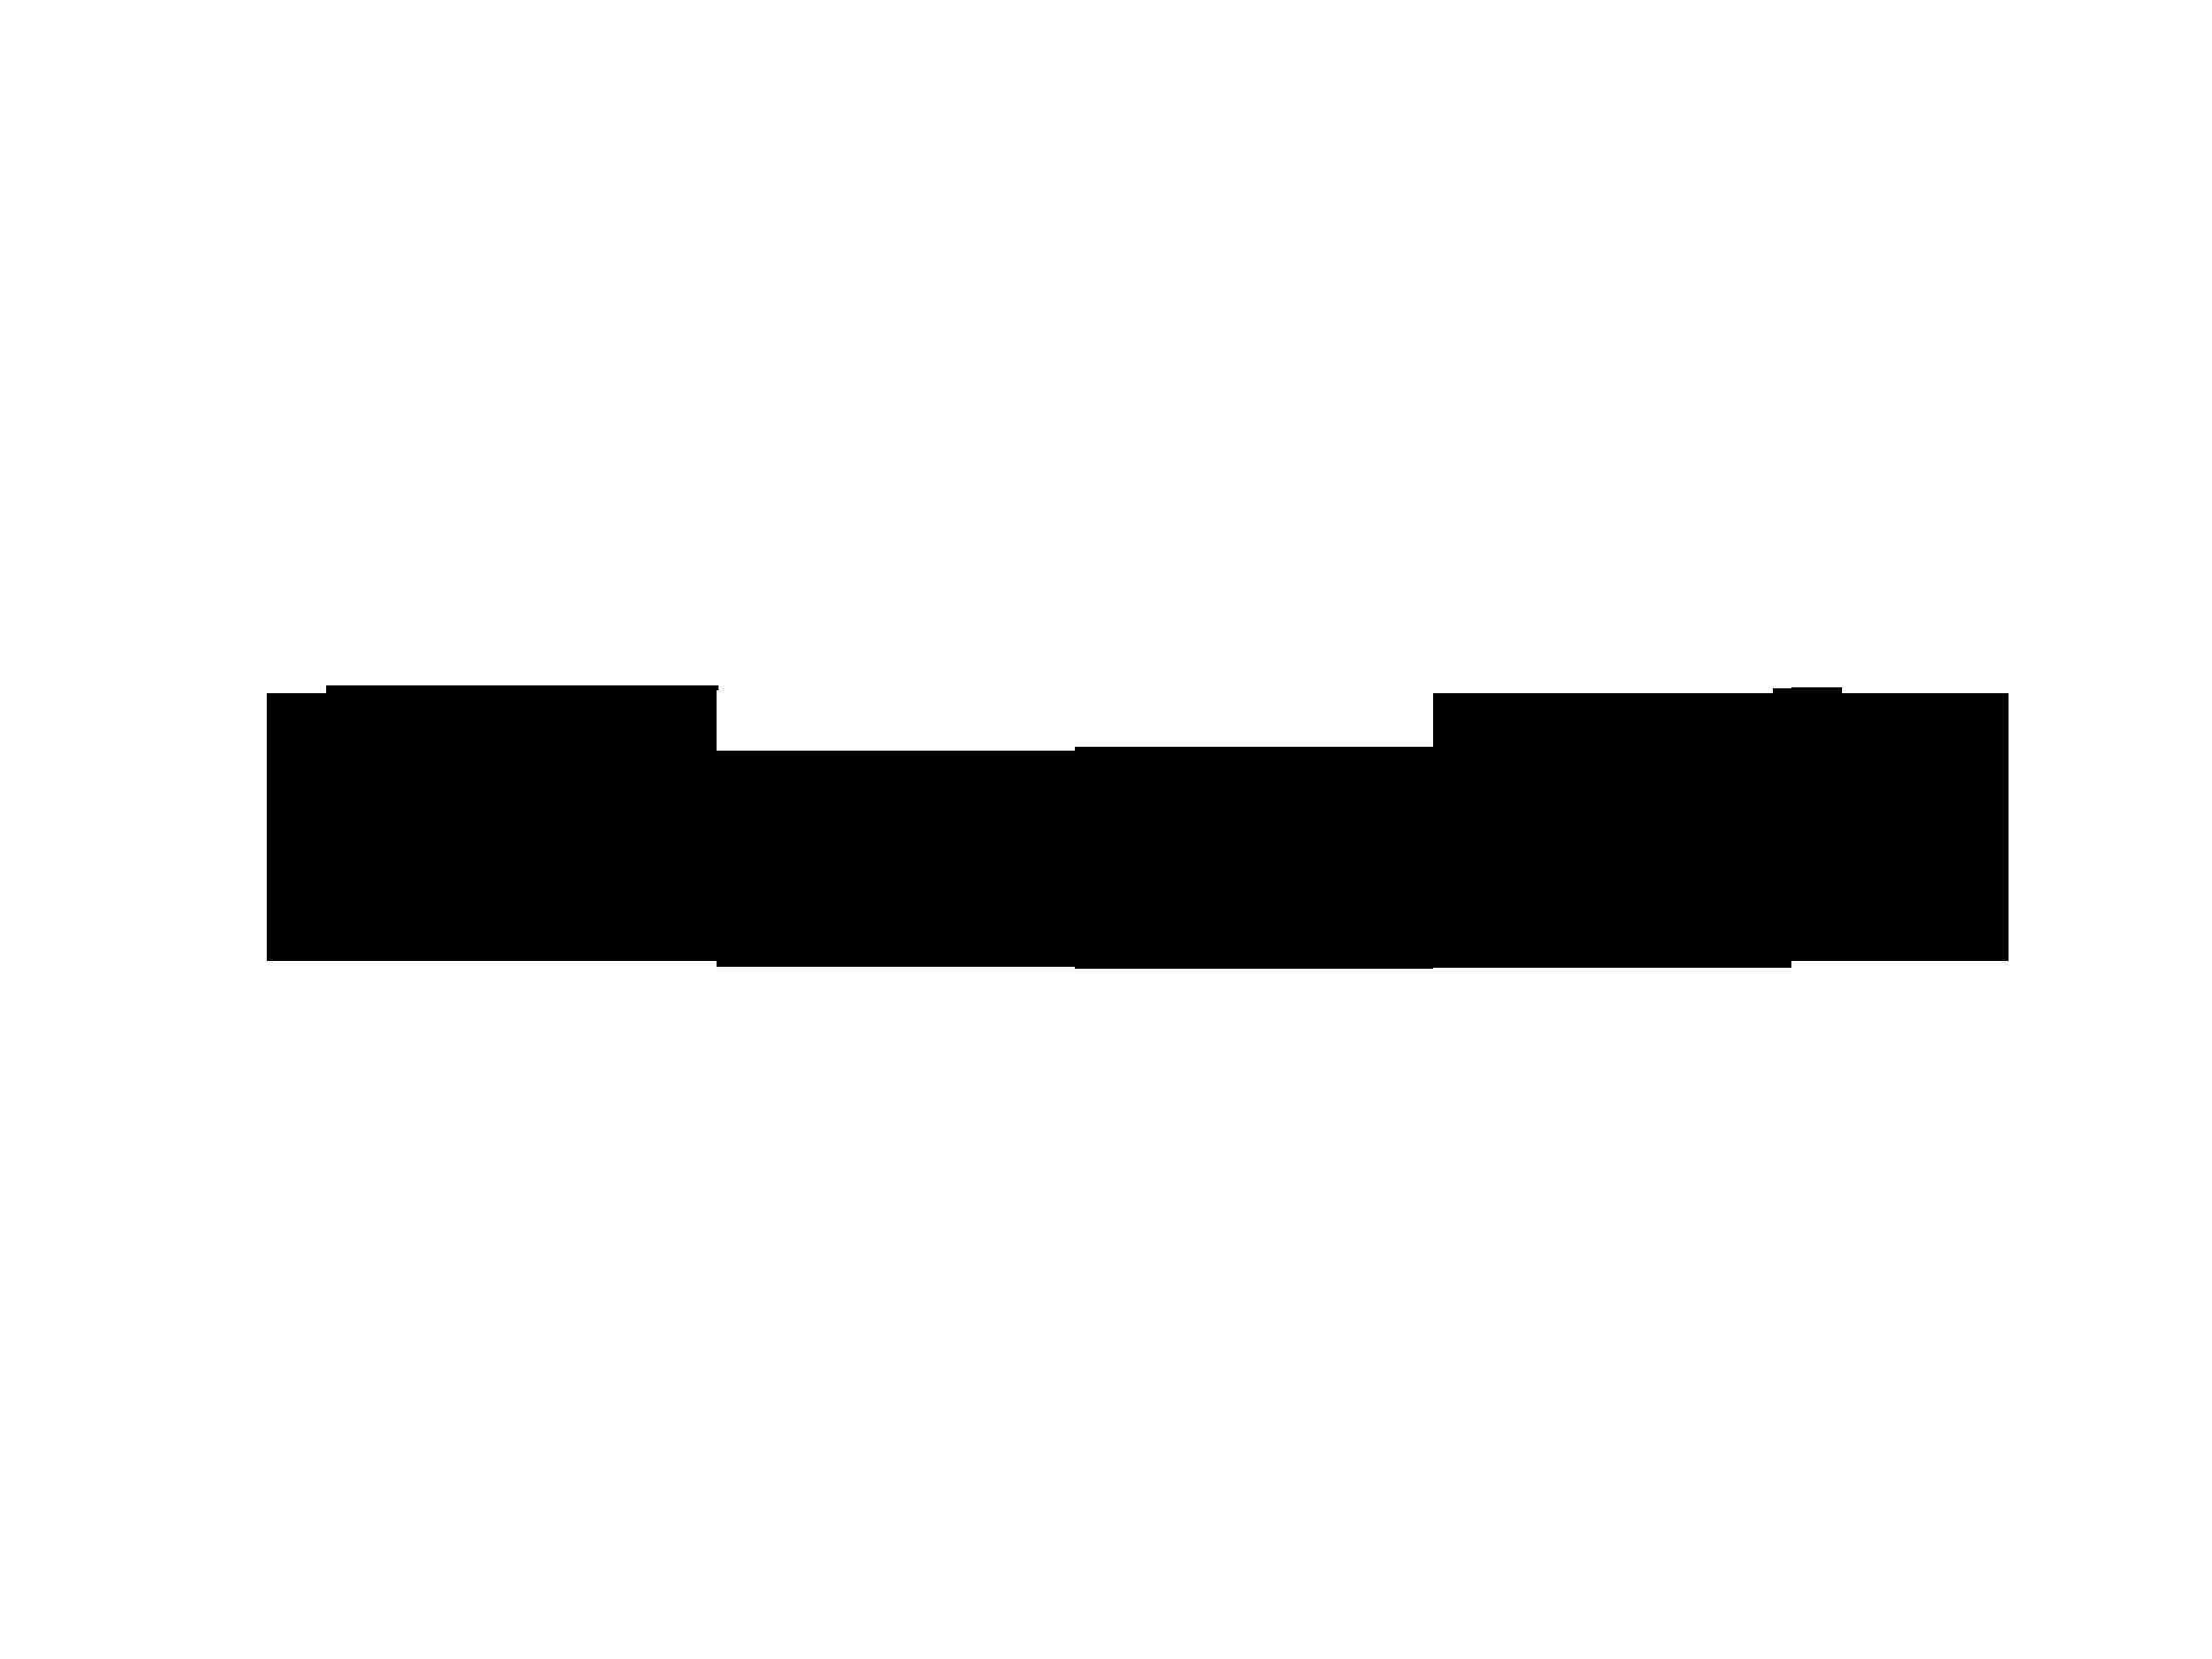 Microsoft-logo-old.png